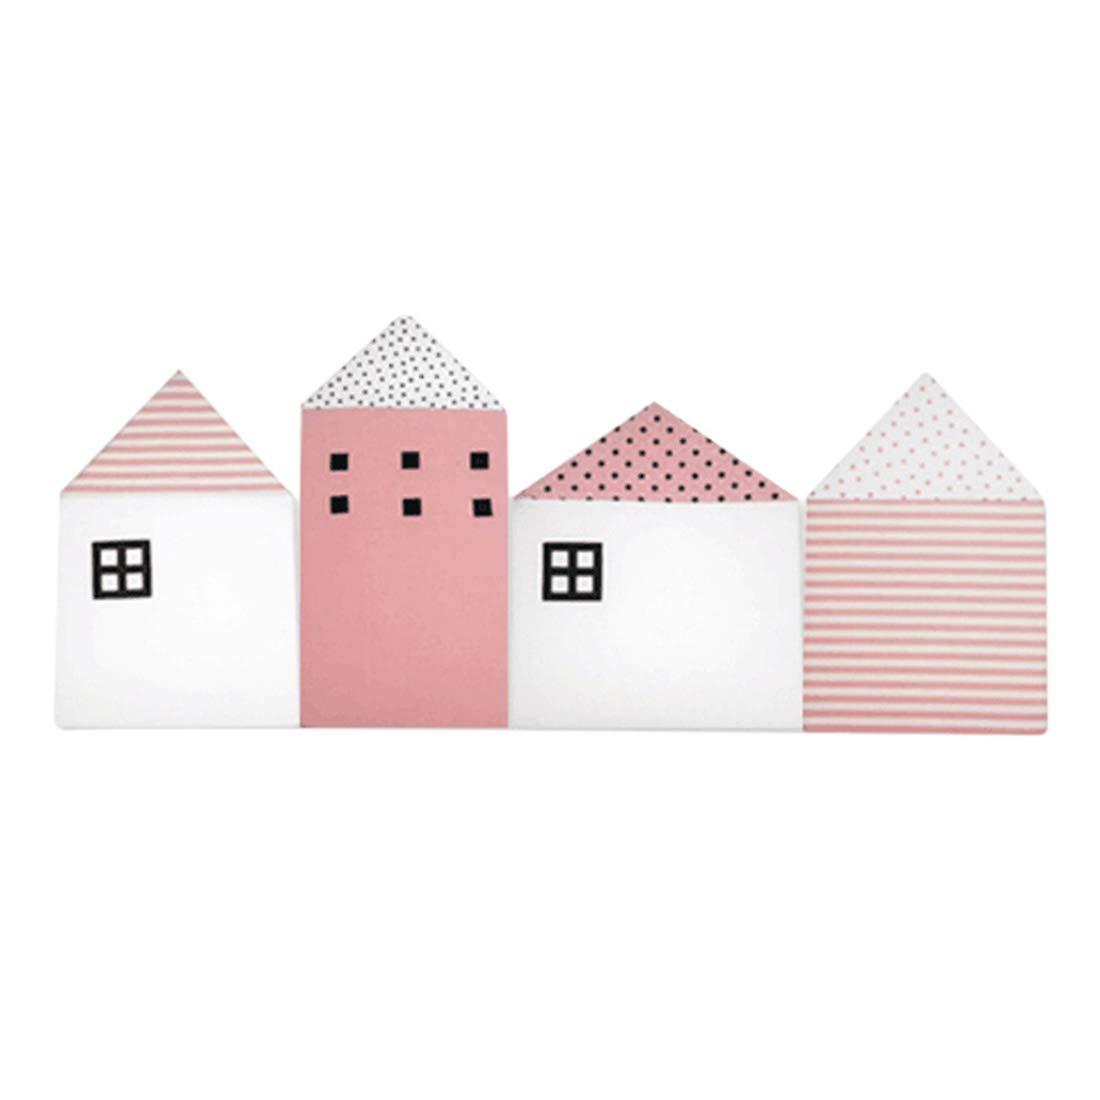 Jiyaru 4 Pieces Baby Crib Bumper Cotton Nursery Cradle Pads House Shape Black